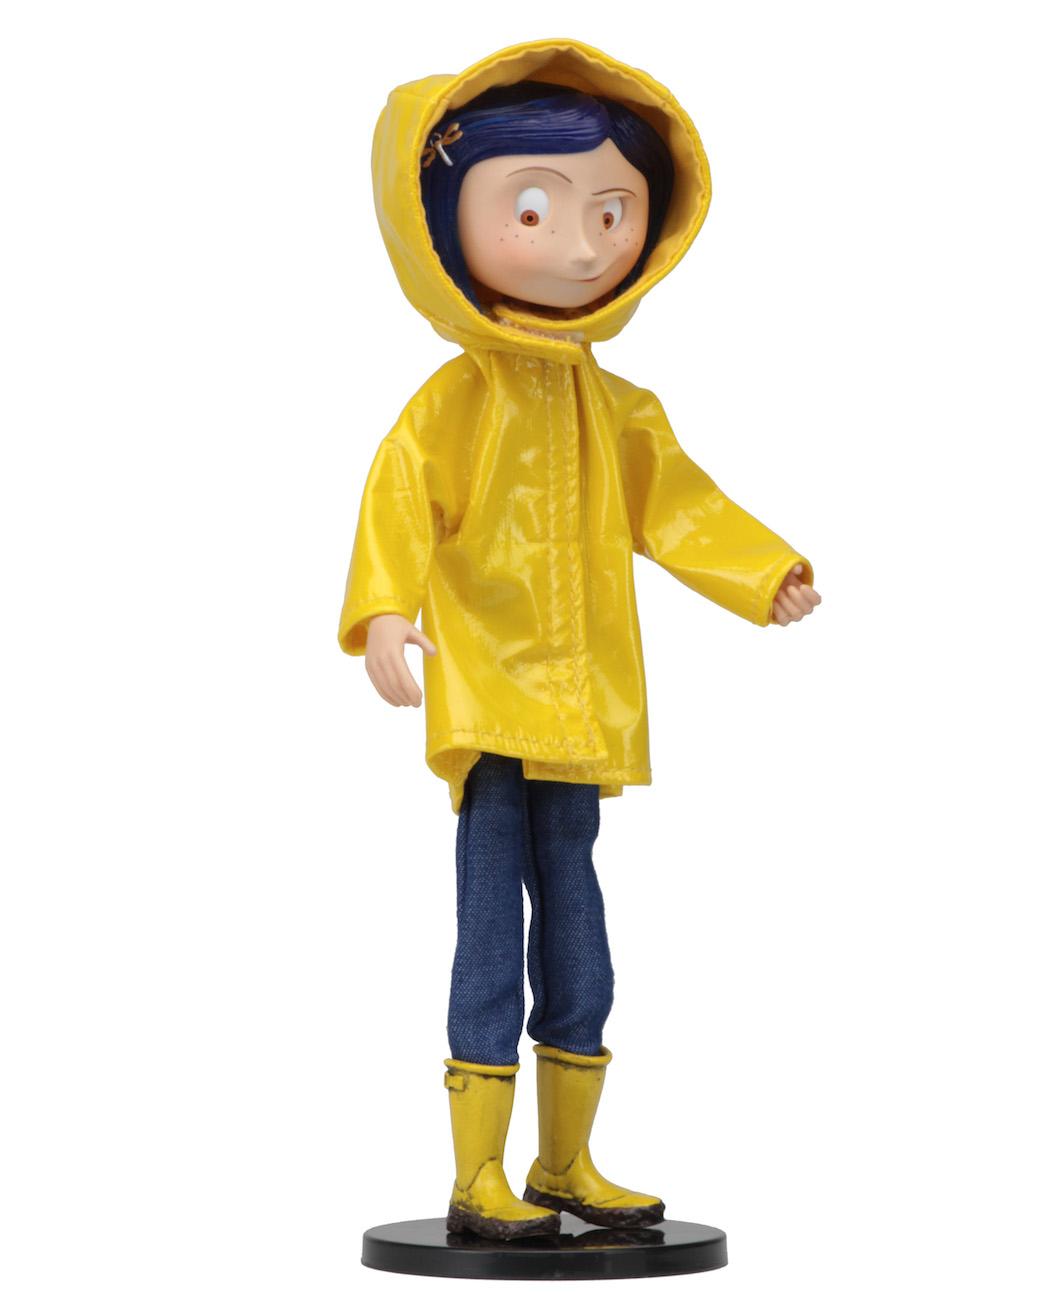 Neca Toys Shipping This Week Coraline Fugitive Predator Chucky Harley Quinn Nightbreed